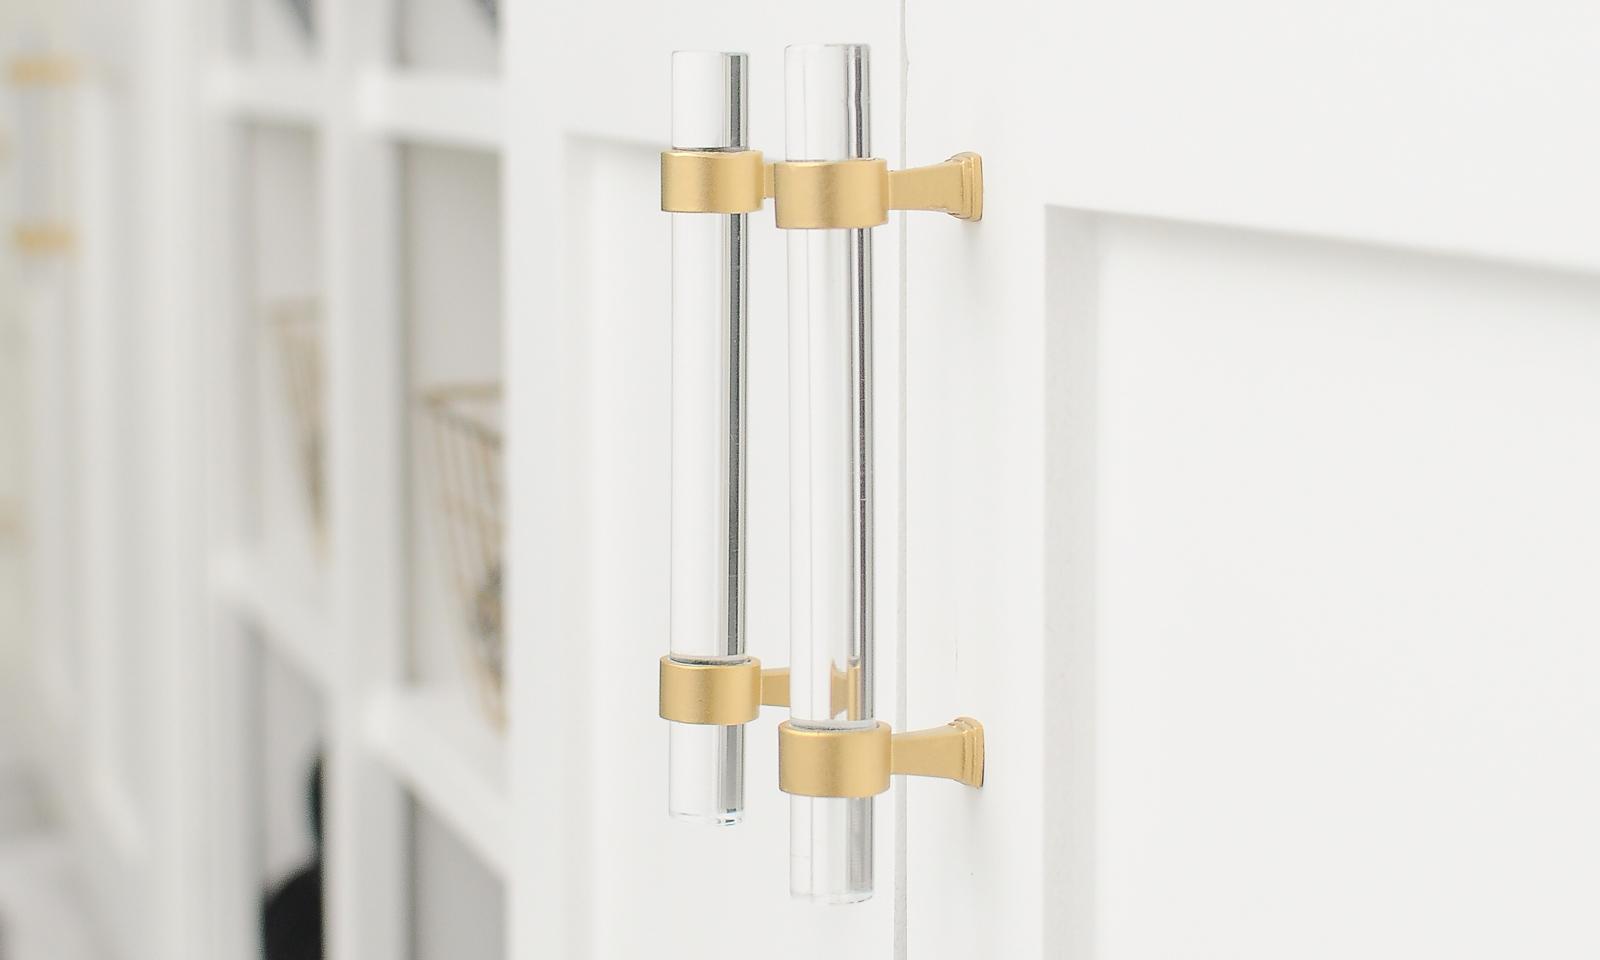 Brushed Brass Cabinet Hardware | Taraba Home Review